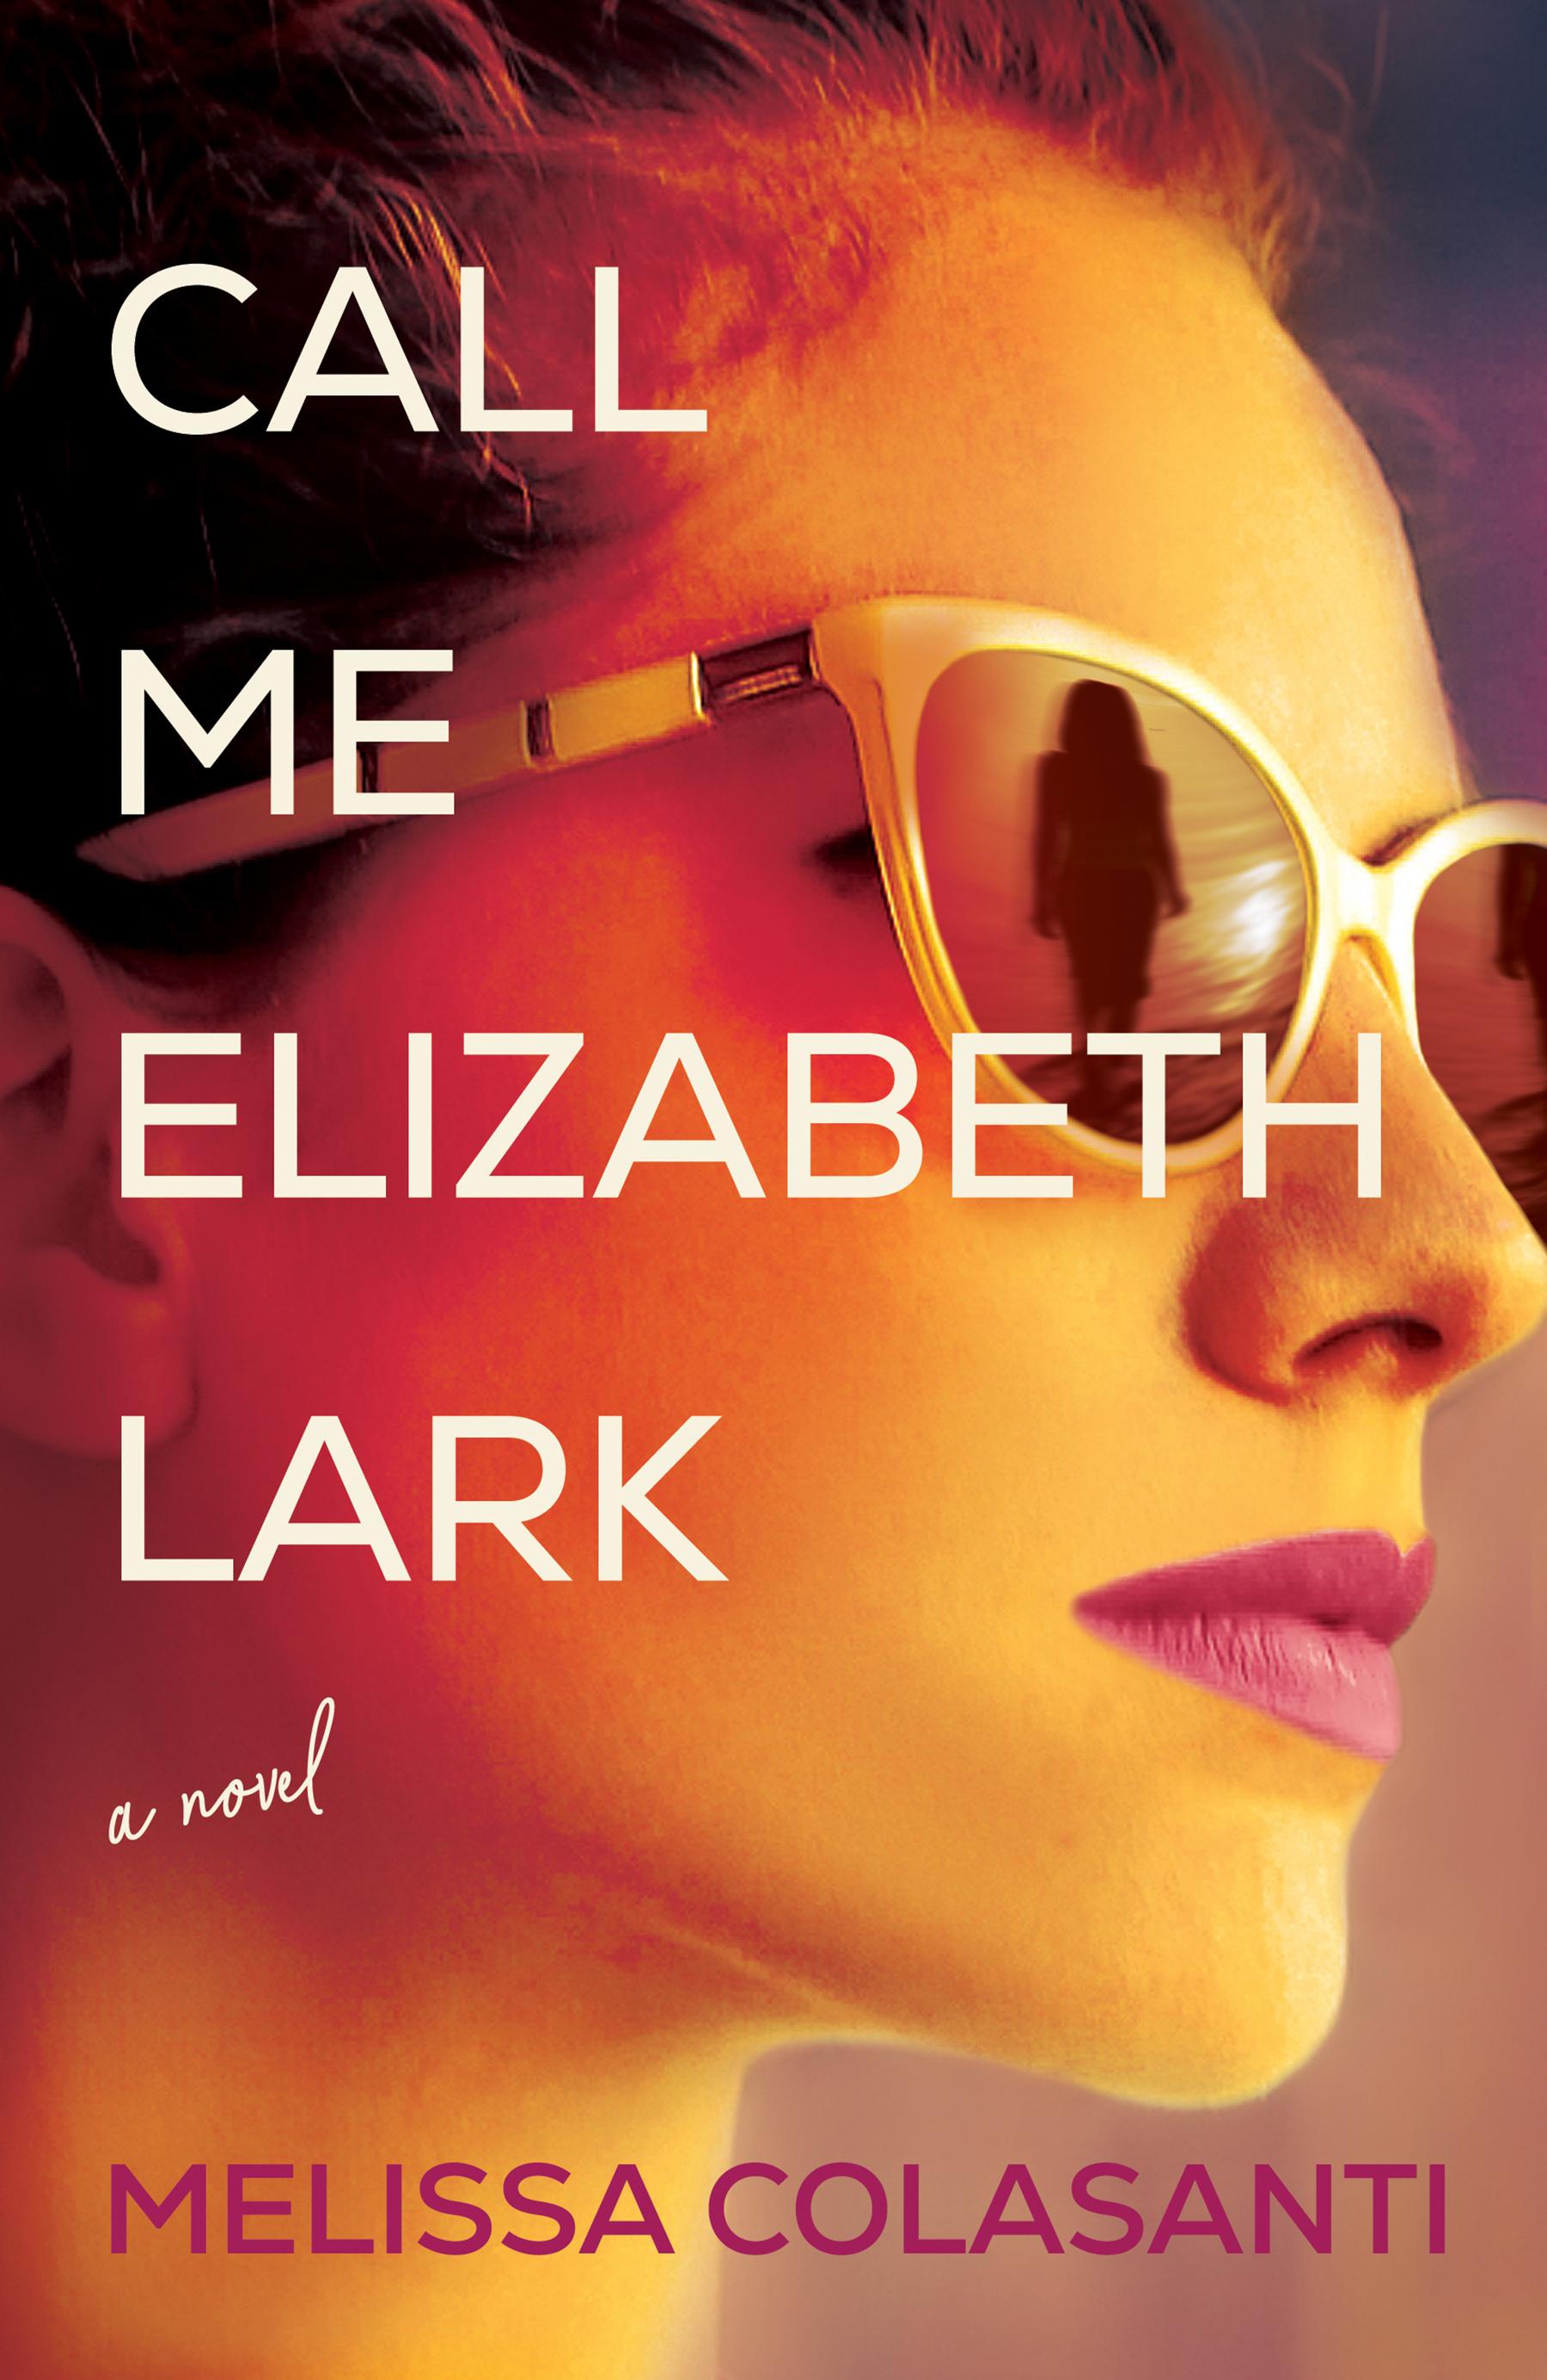 CALL ME ELIZABETH LARK - EColasanti